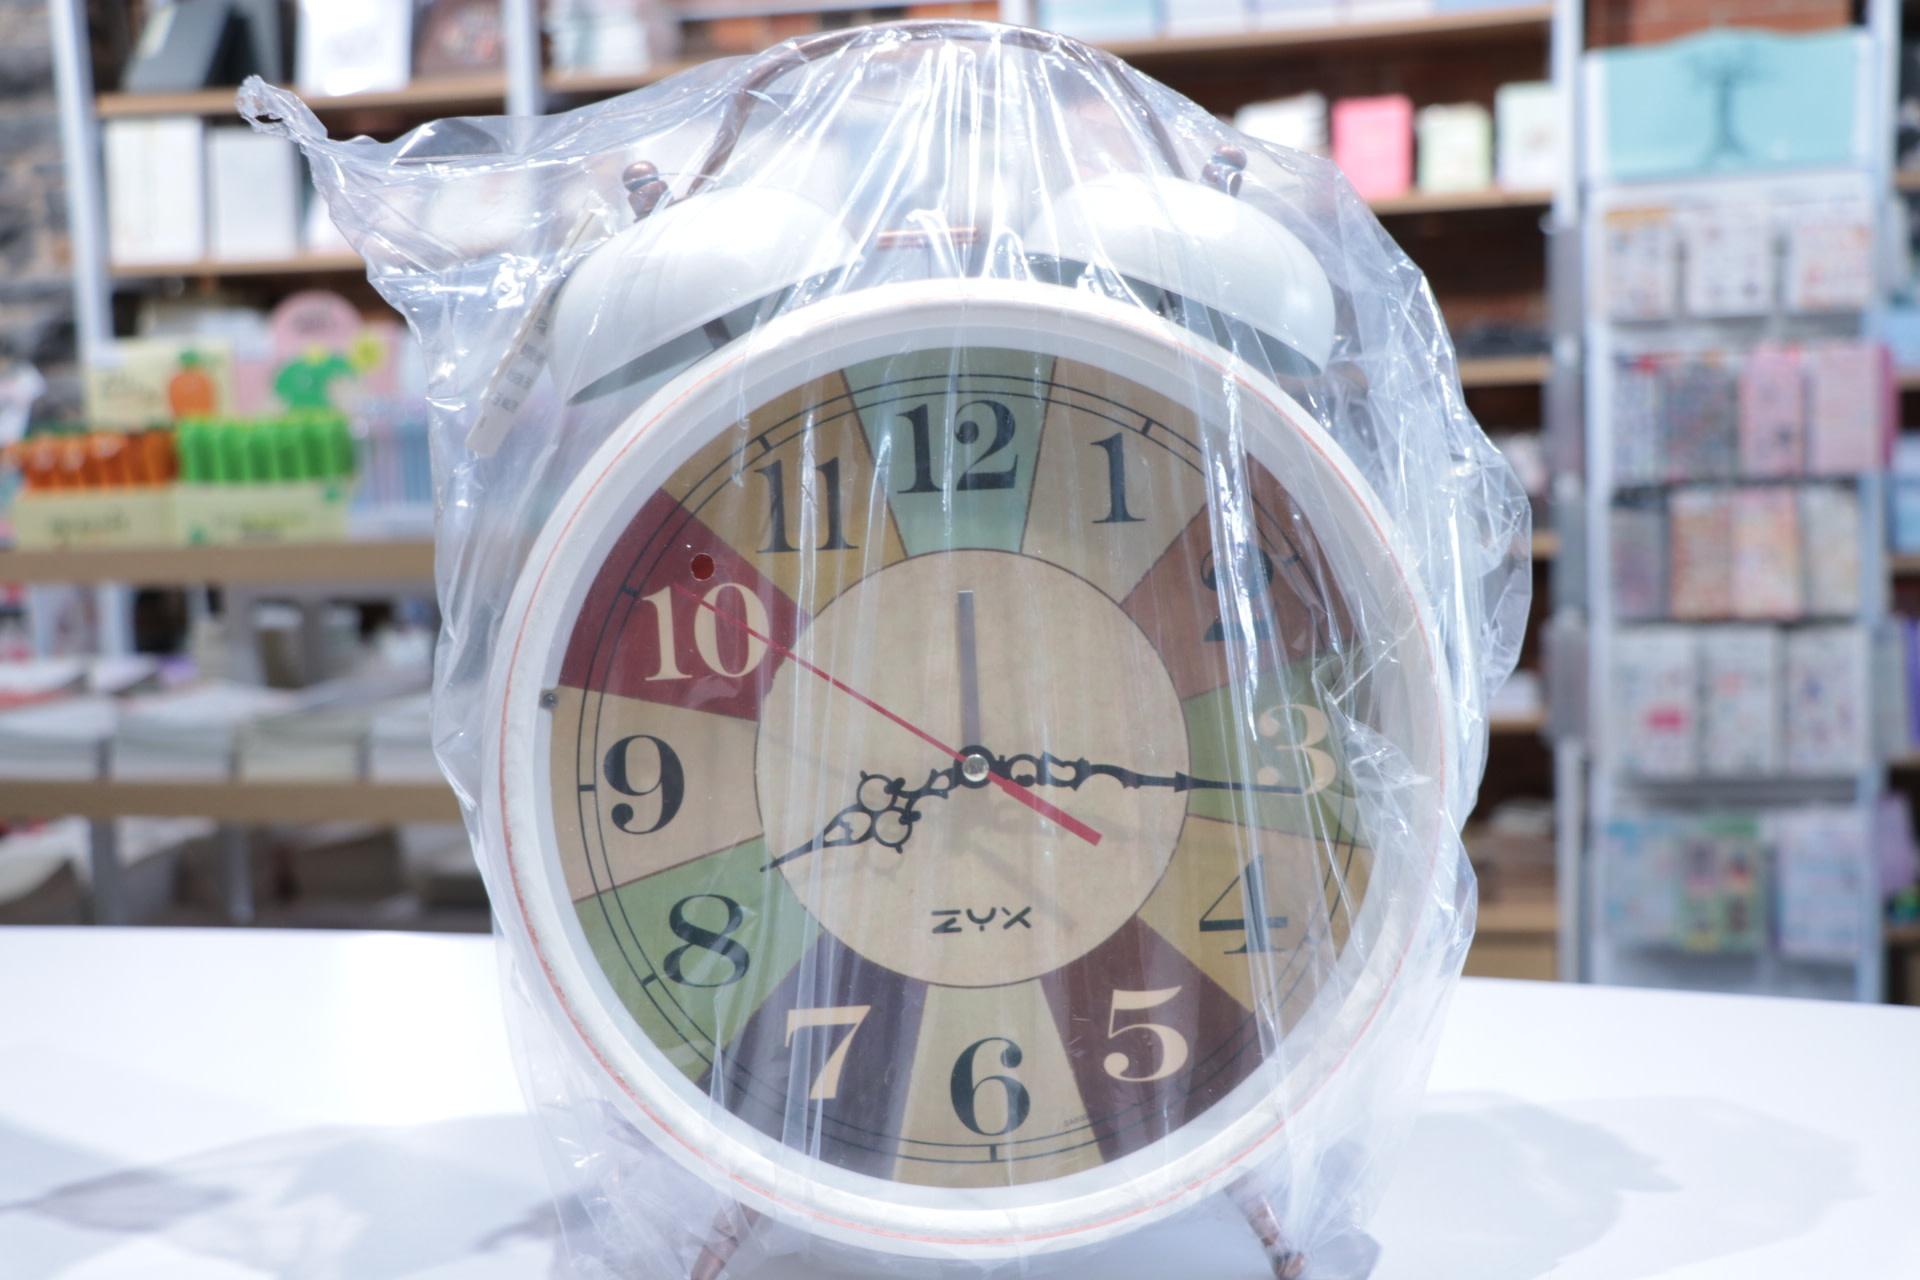 Large Clocks with alarm